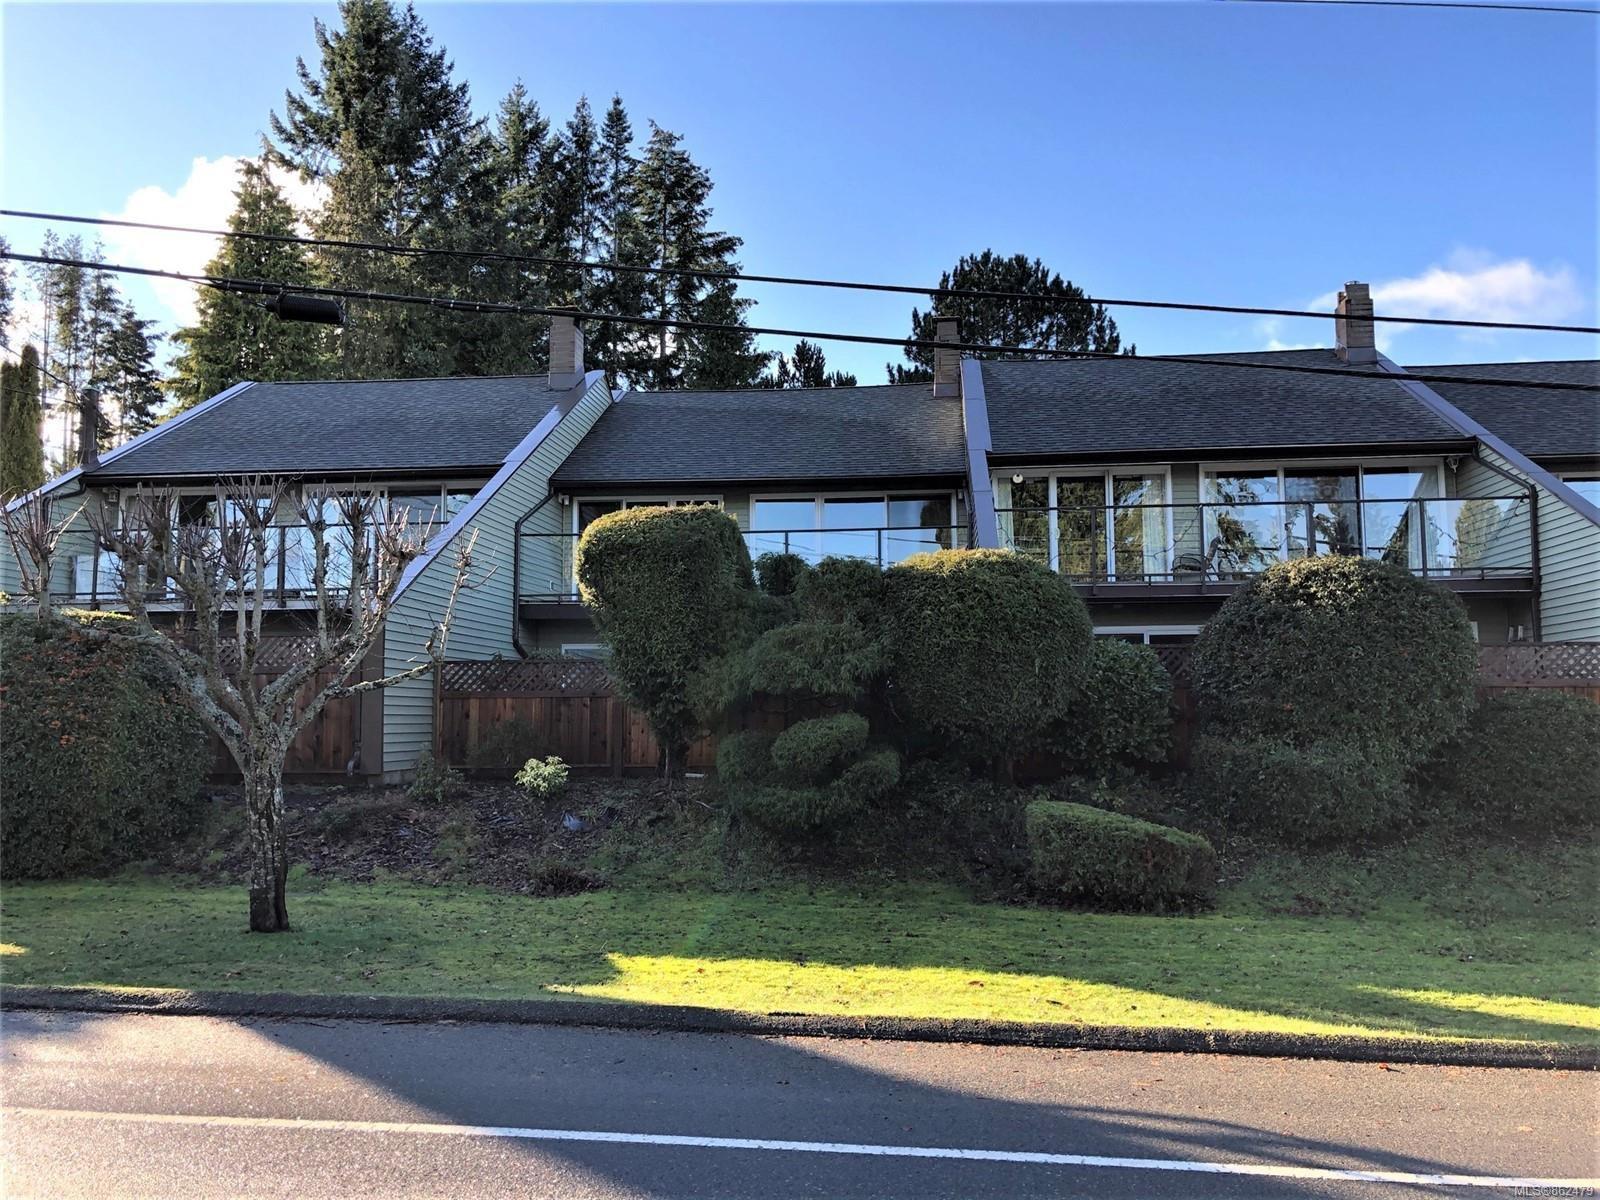 Main Photo: 6 570 W CRESCENT Rd in : PQ Qualicum Beach Row/Townhouse for sale (Parksville/Qualicum)  : MLS®# 862479